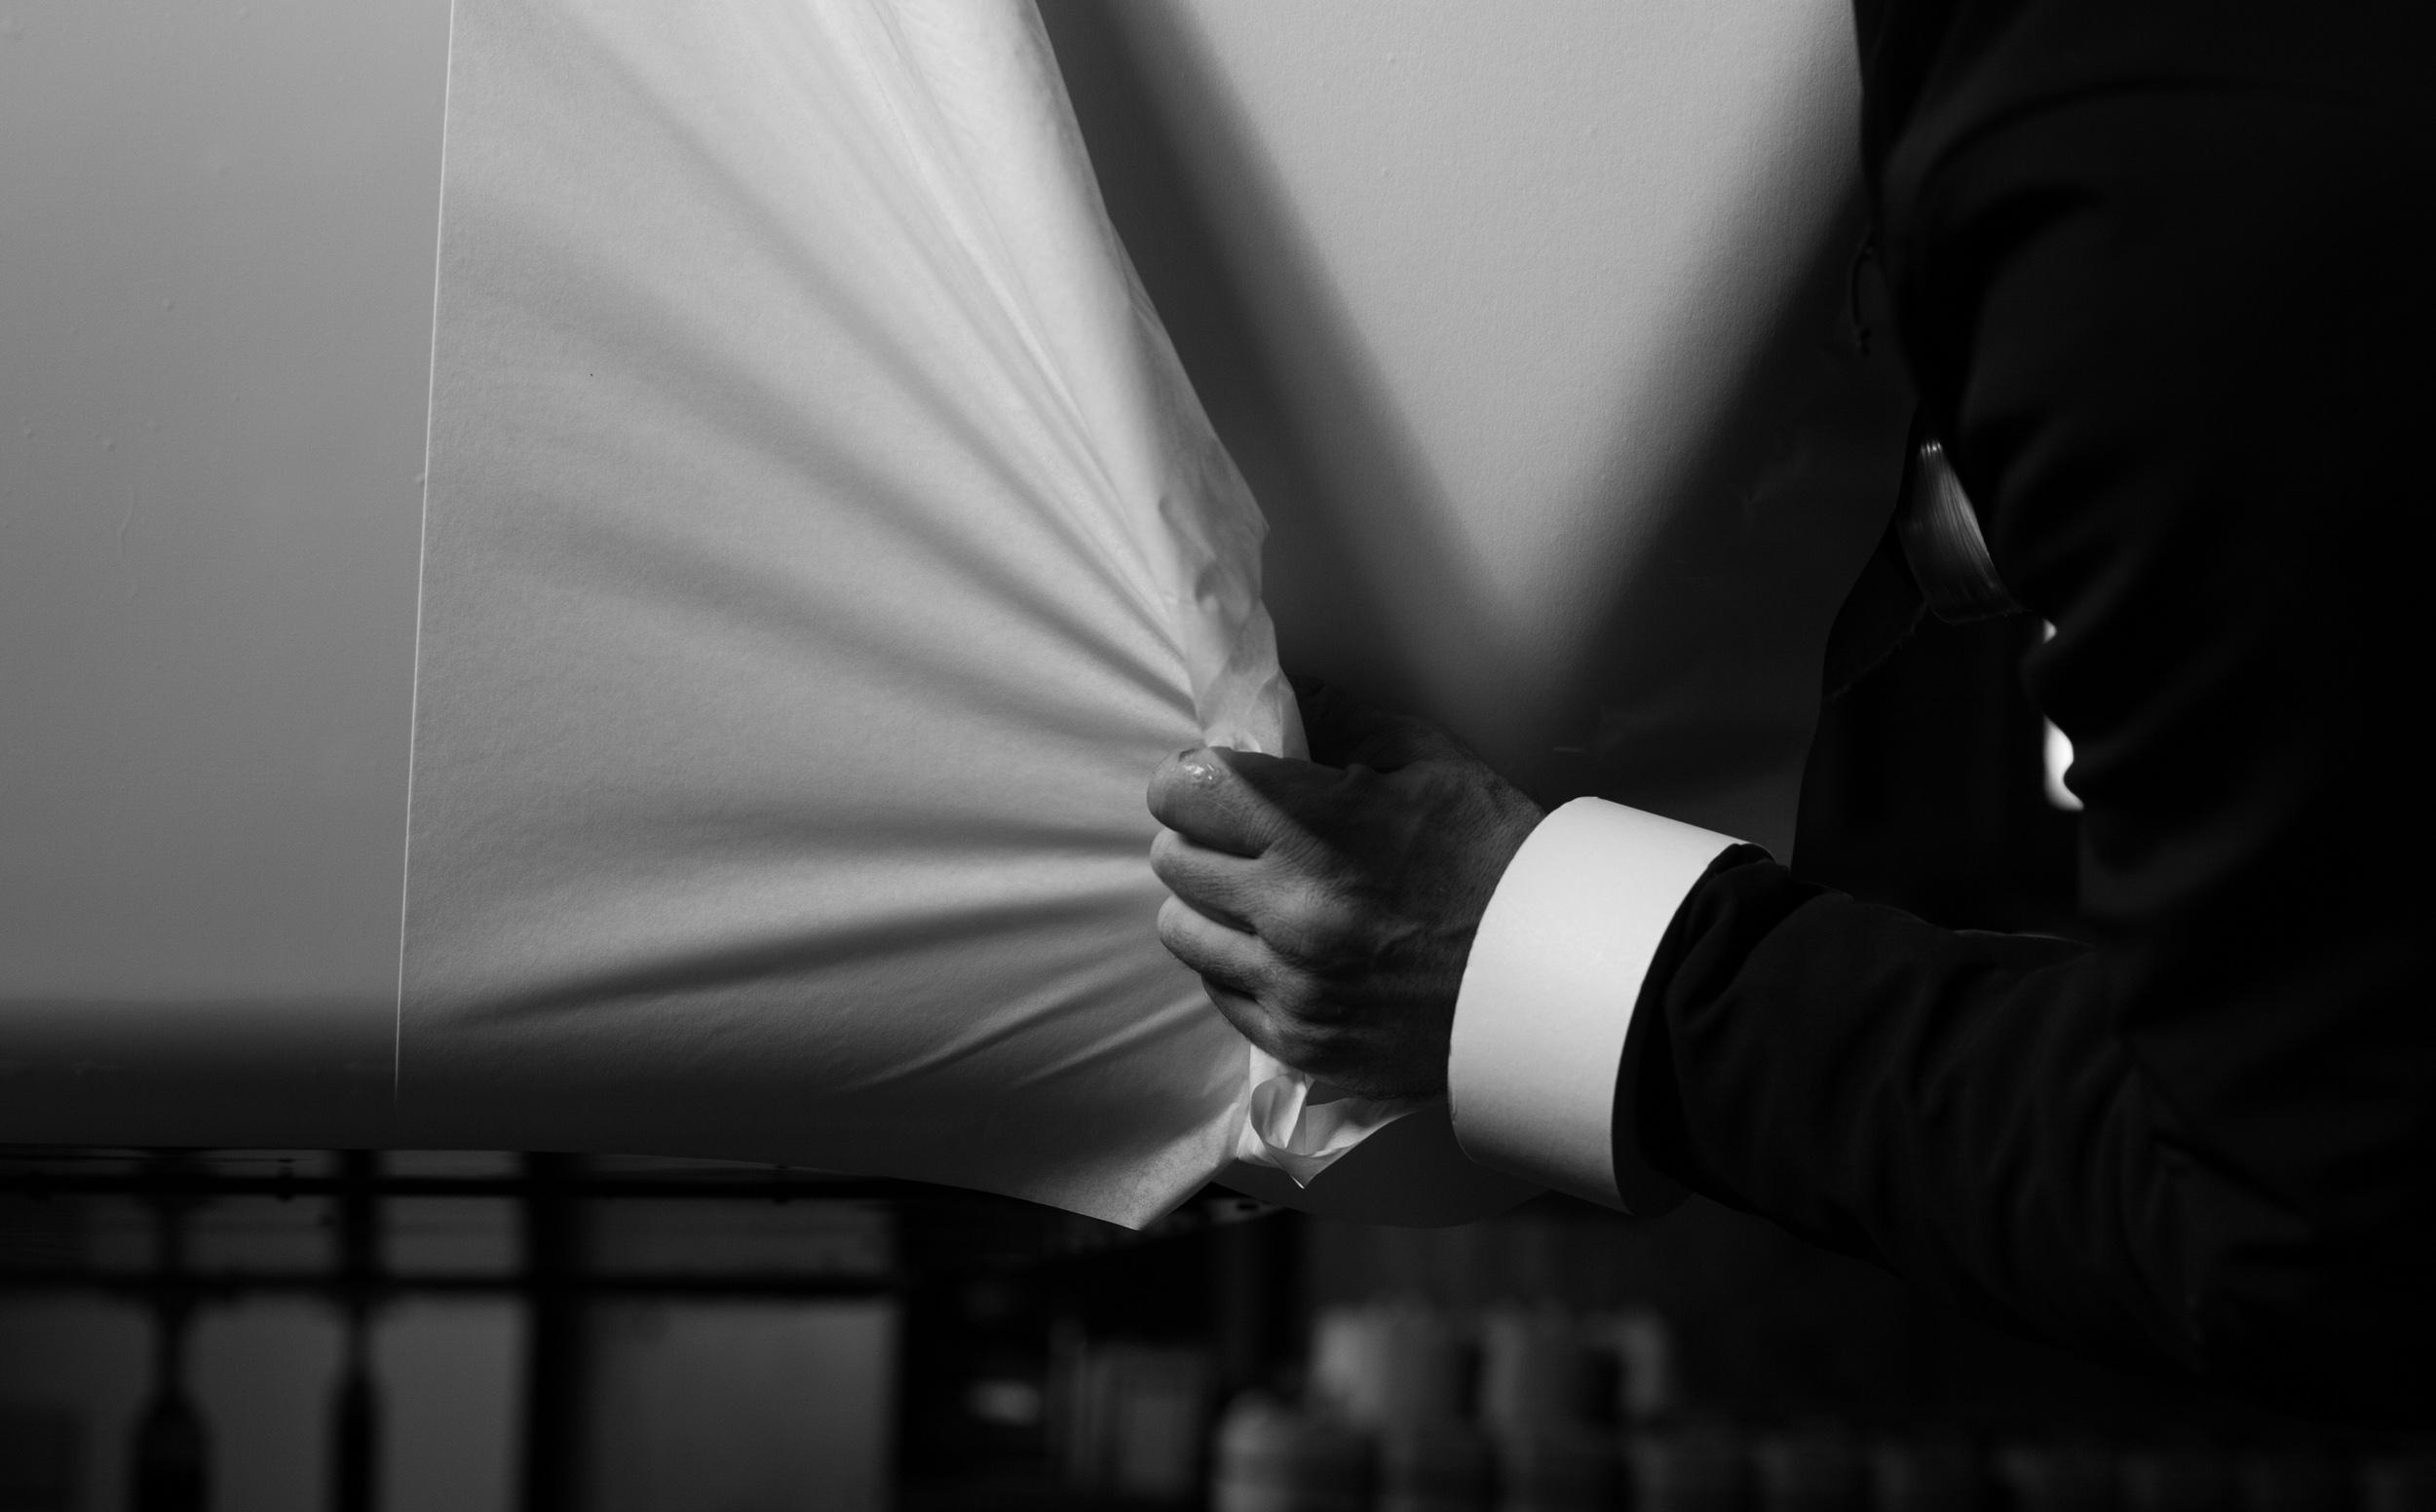 9SELECTION_MAKING_OF-GRANDBORAMA-©AUGUSTIN_LOSSERAND-BD